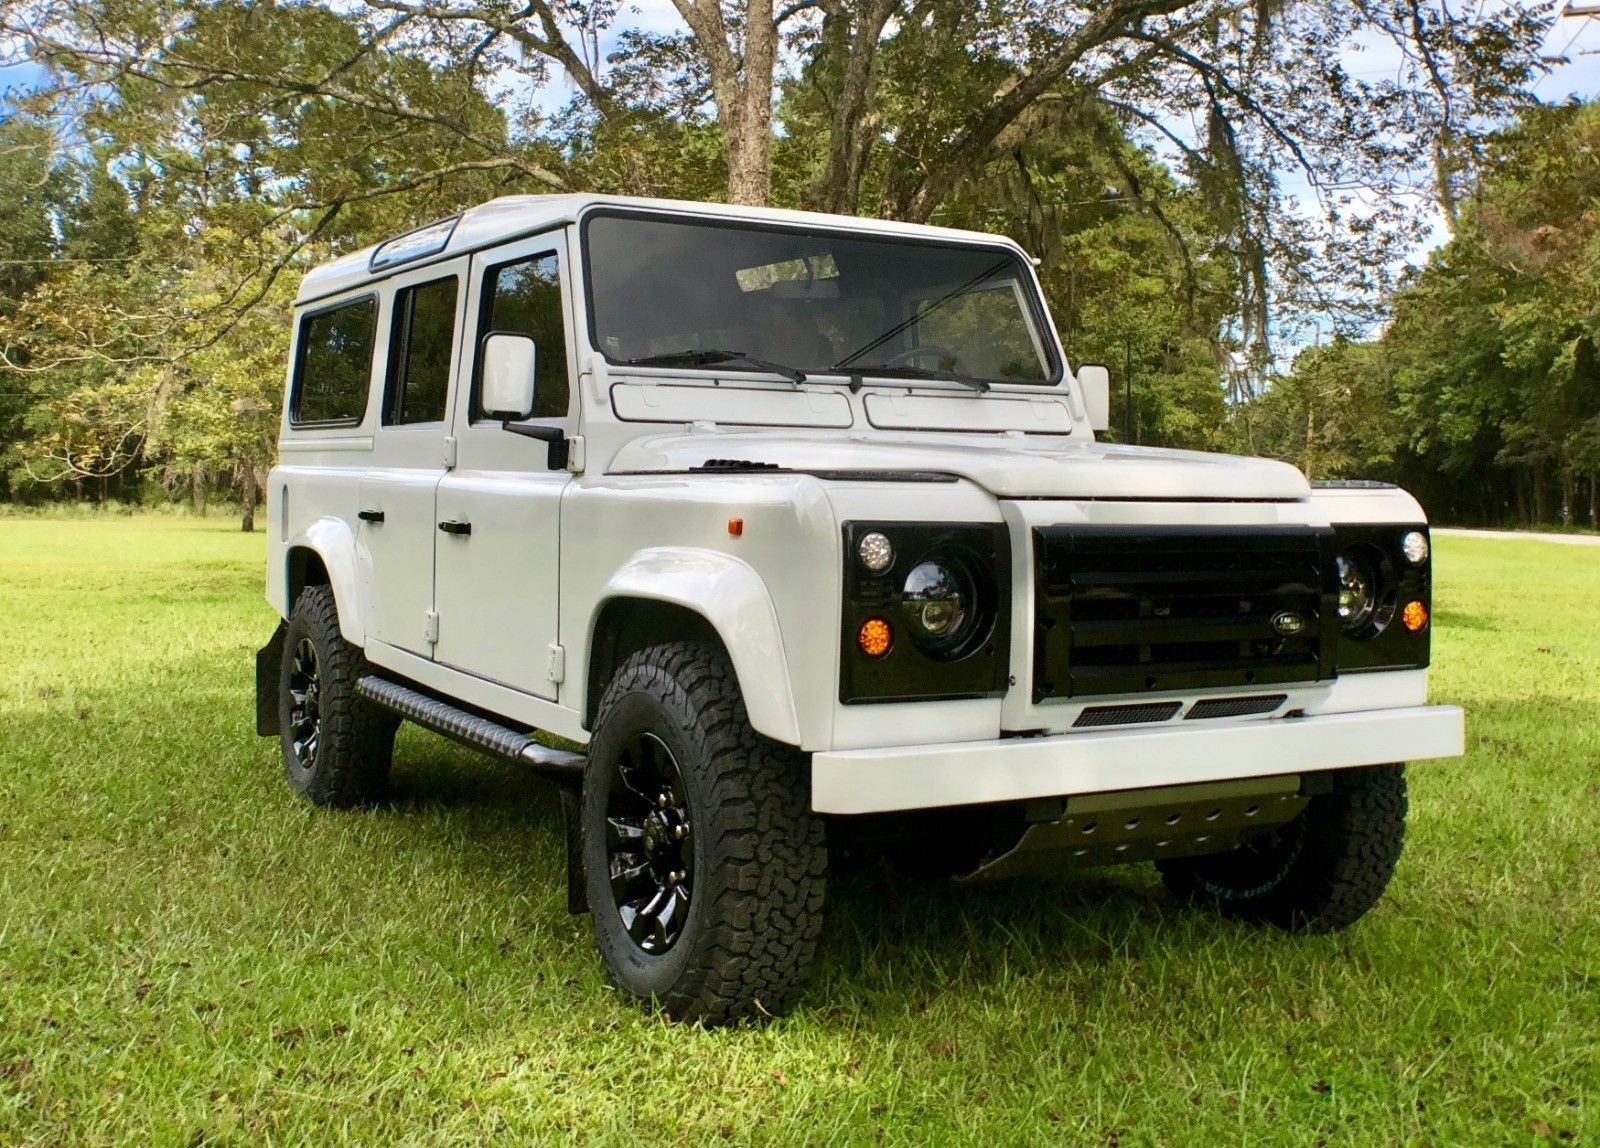 1992 Land Rover Defender  Fully Restored Land Rover Defender 110 by HIMALAYA